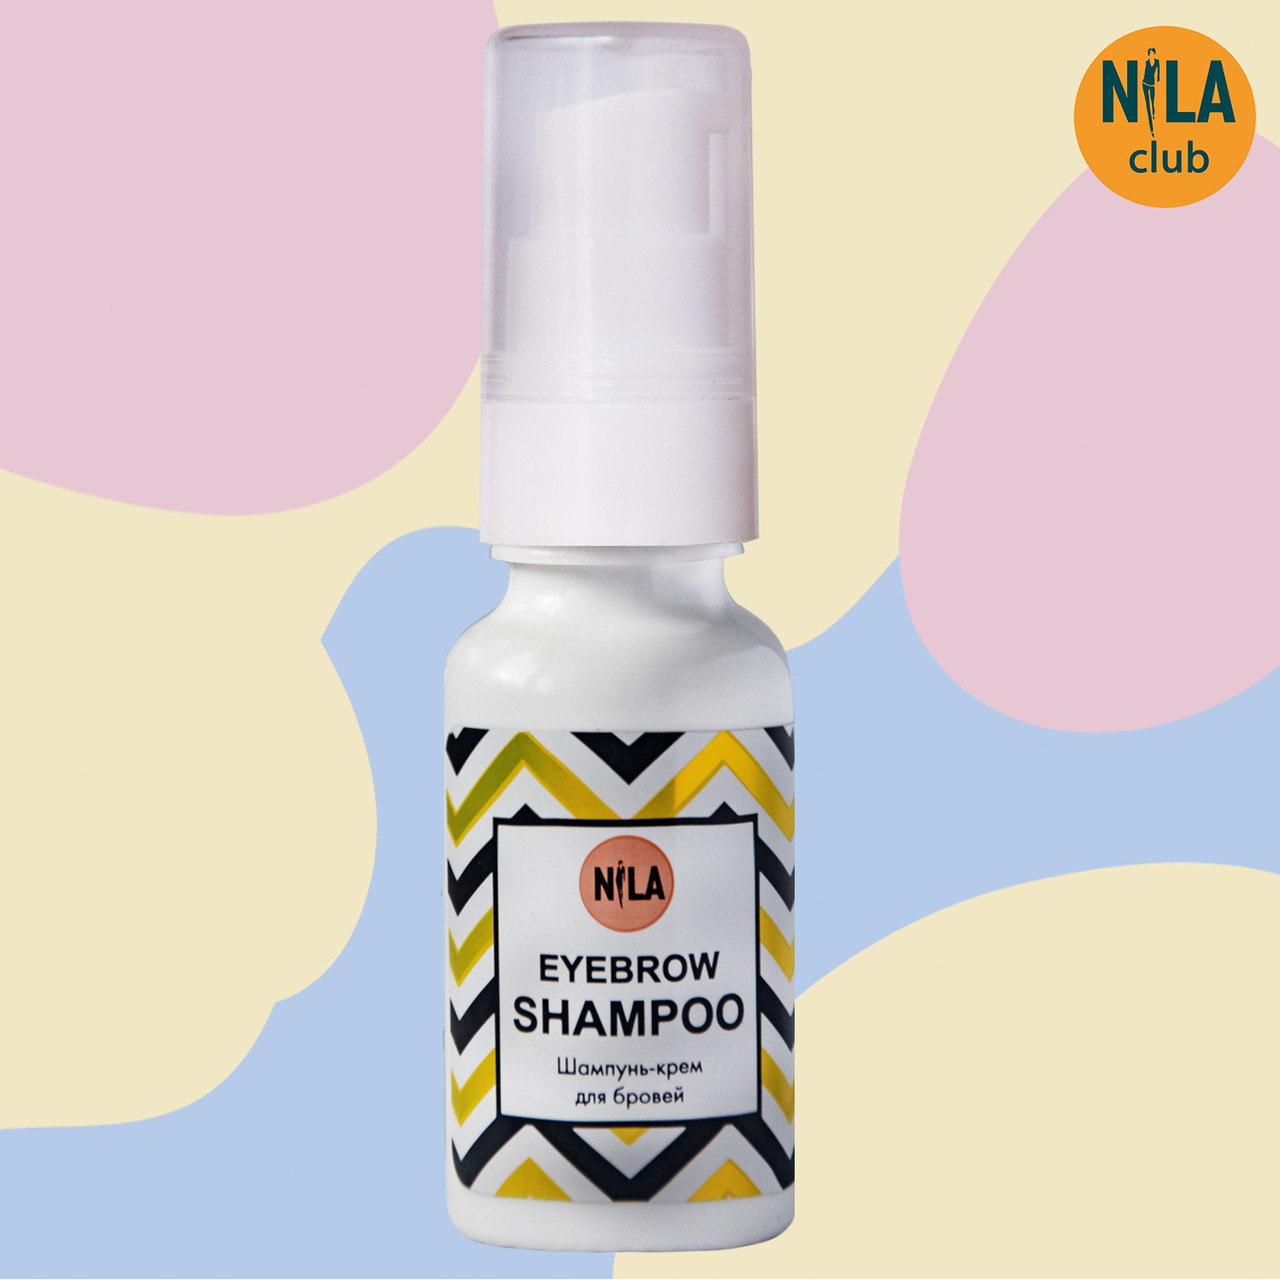 Nila Eyebrow Shampoo (шампунь для брів), 30 мл